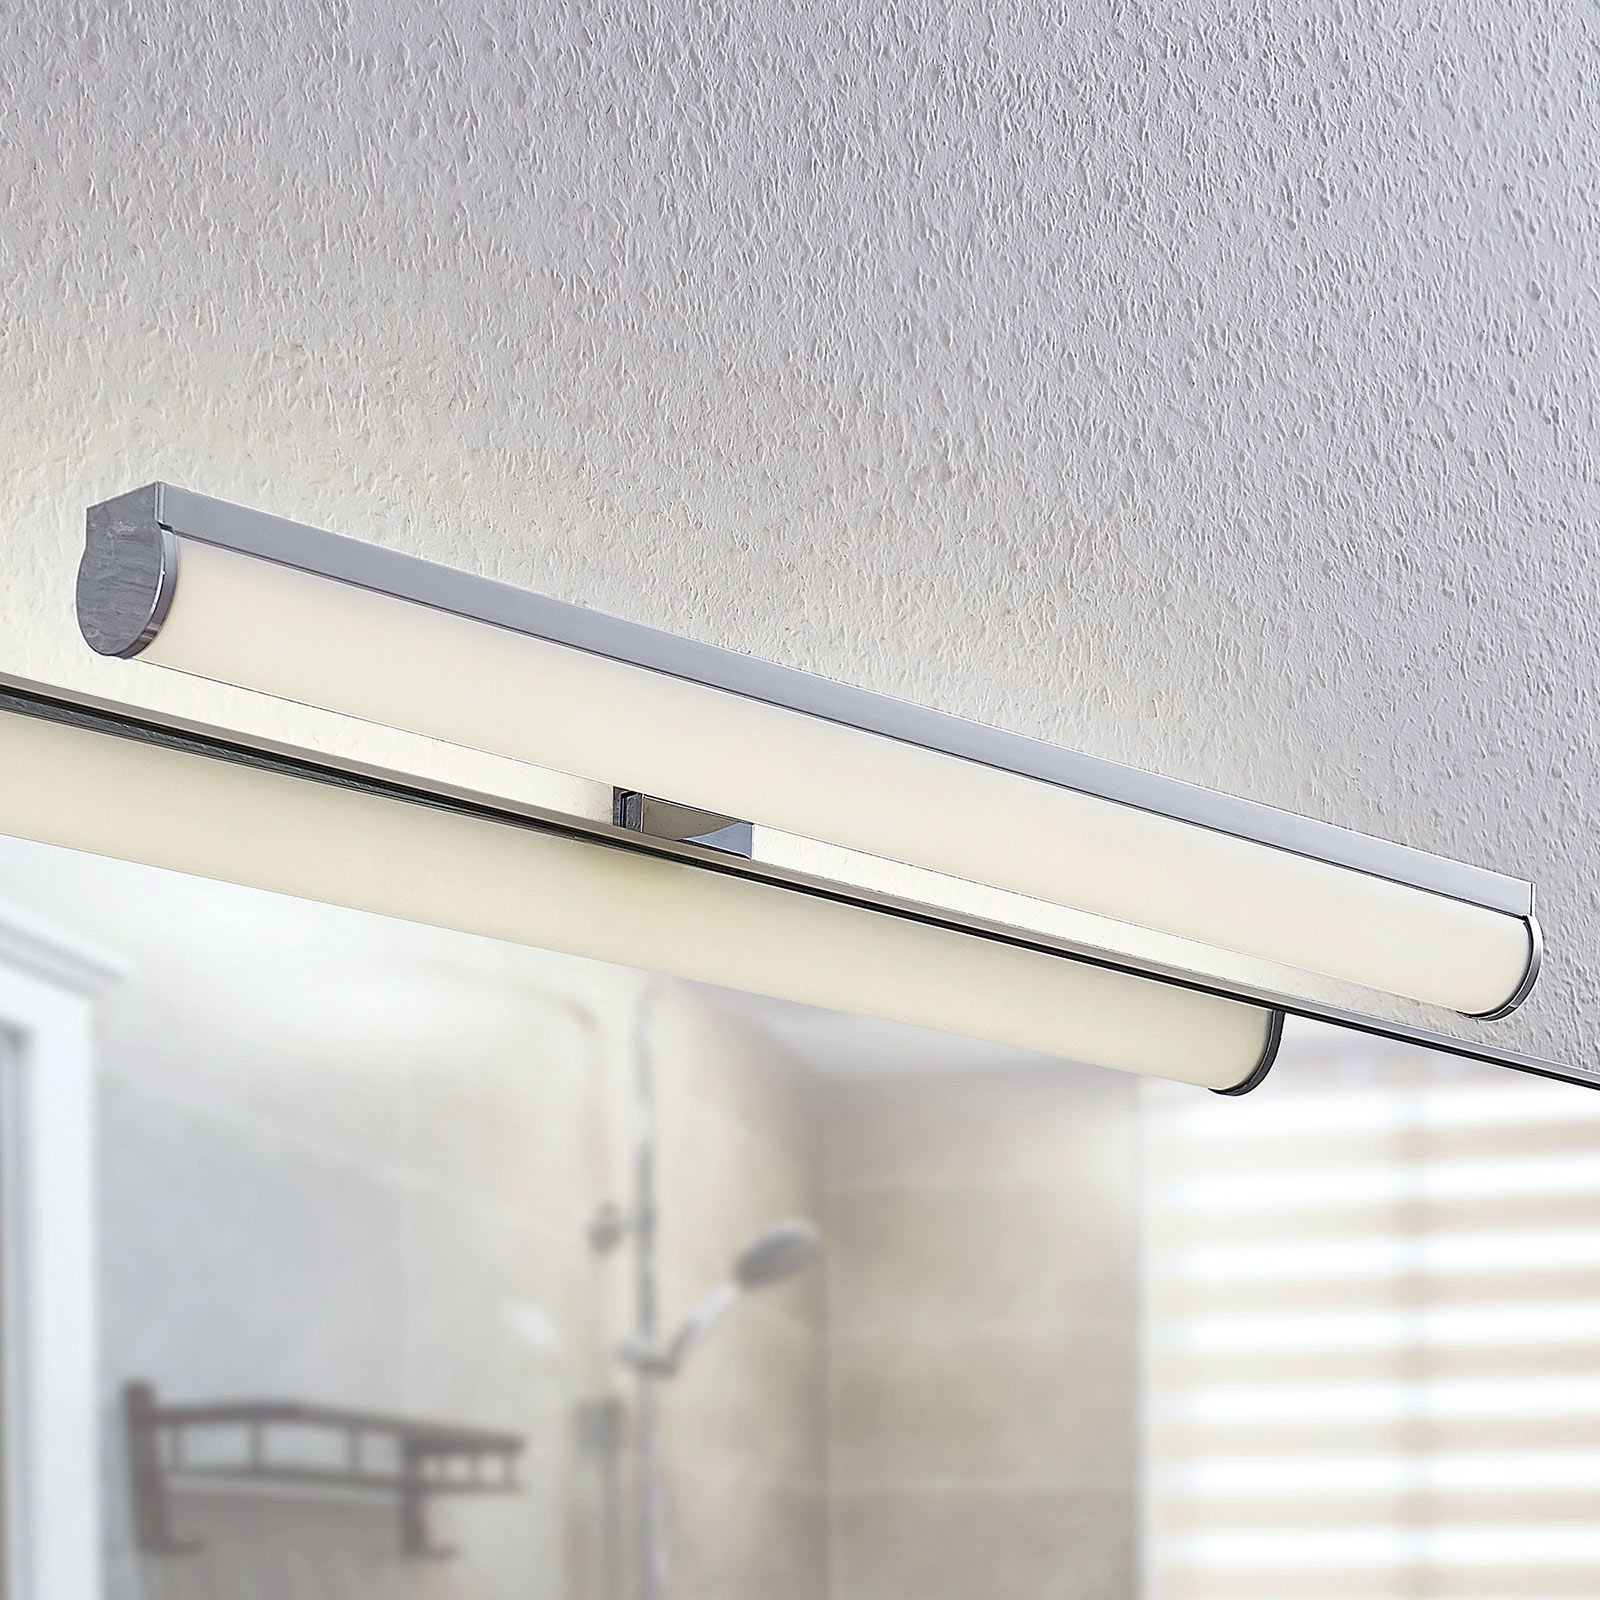 Kylpyhuoneen LED-peililamppu Irmena, 50 cm